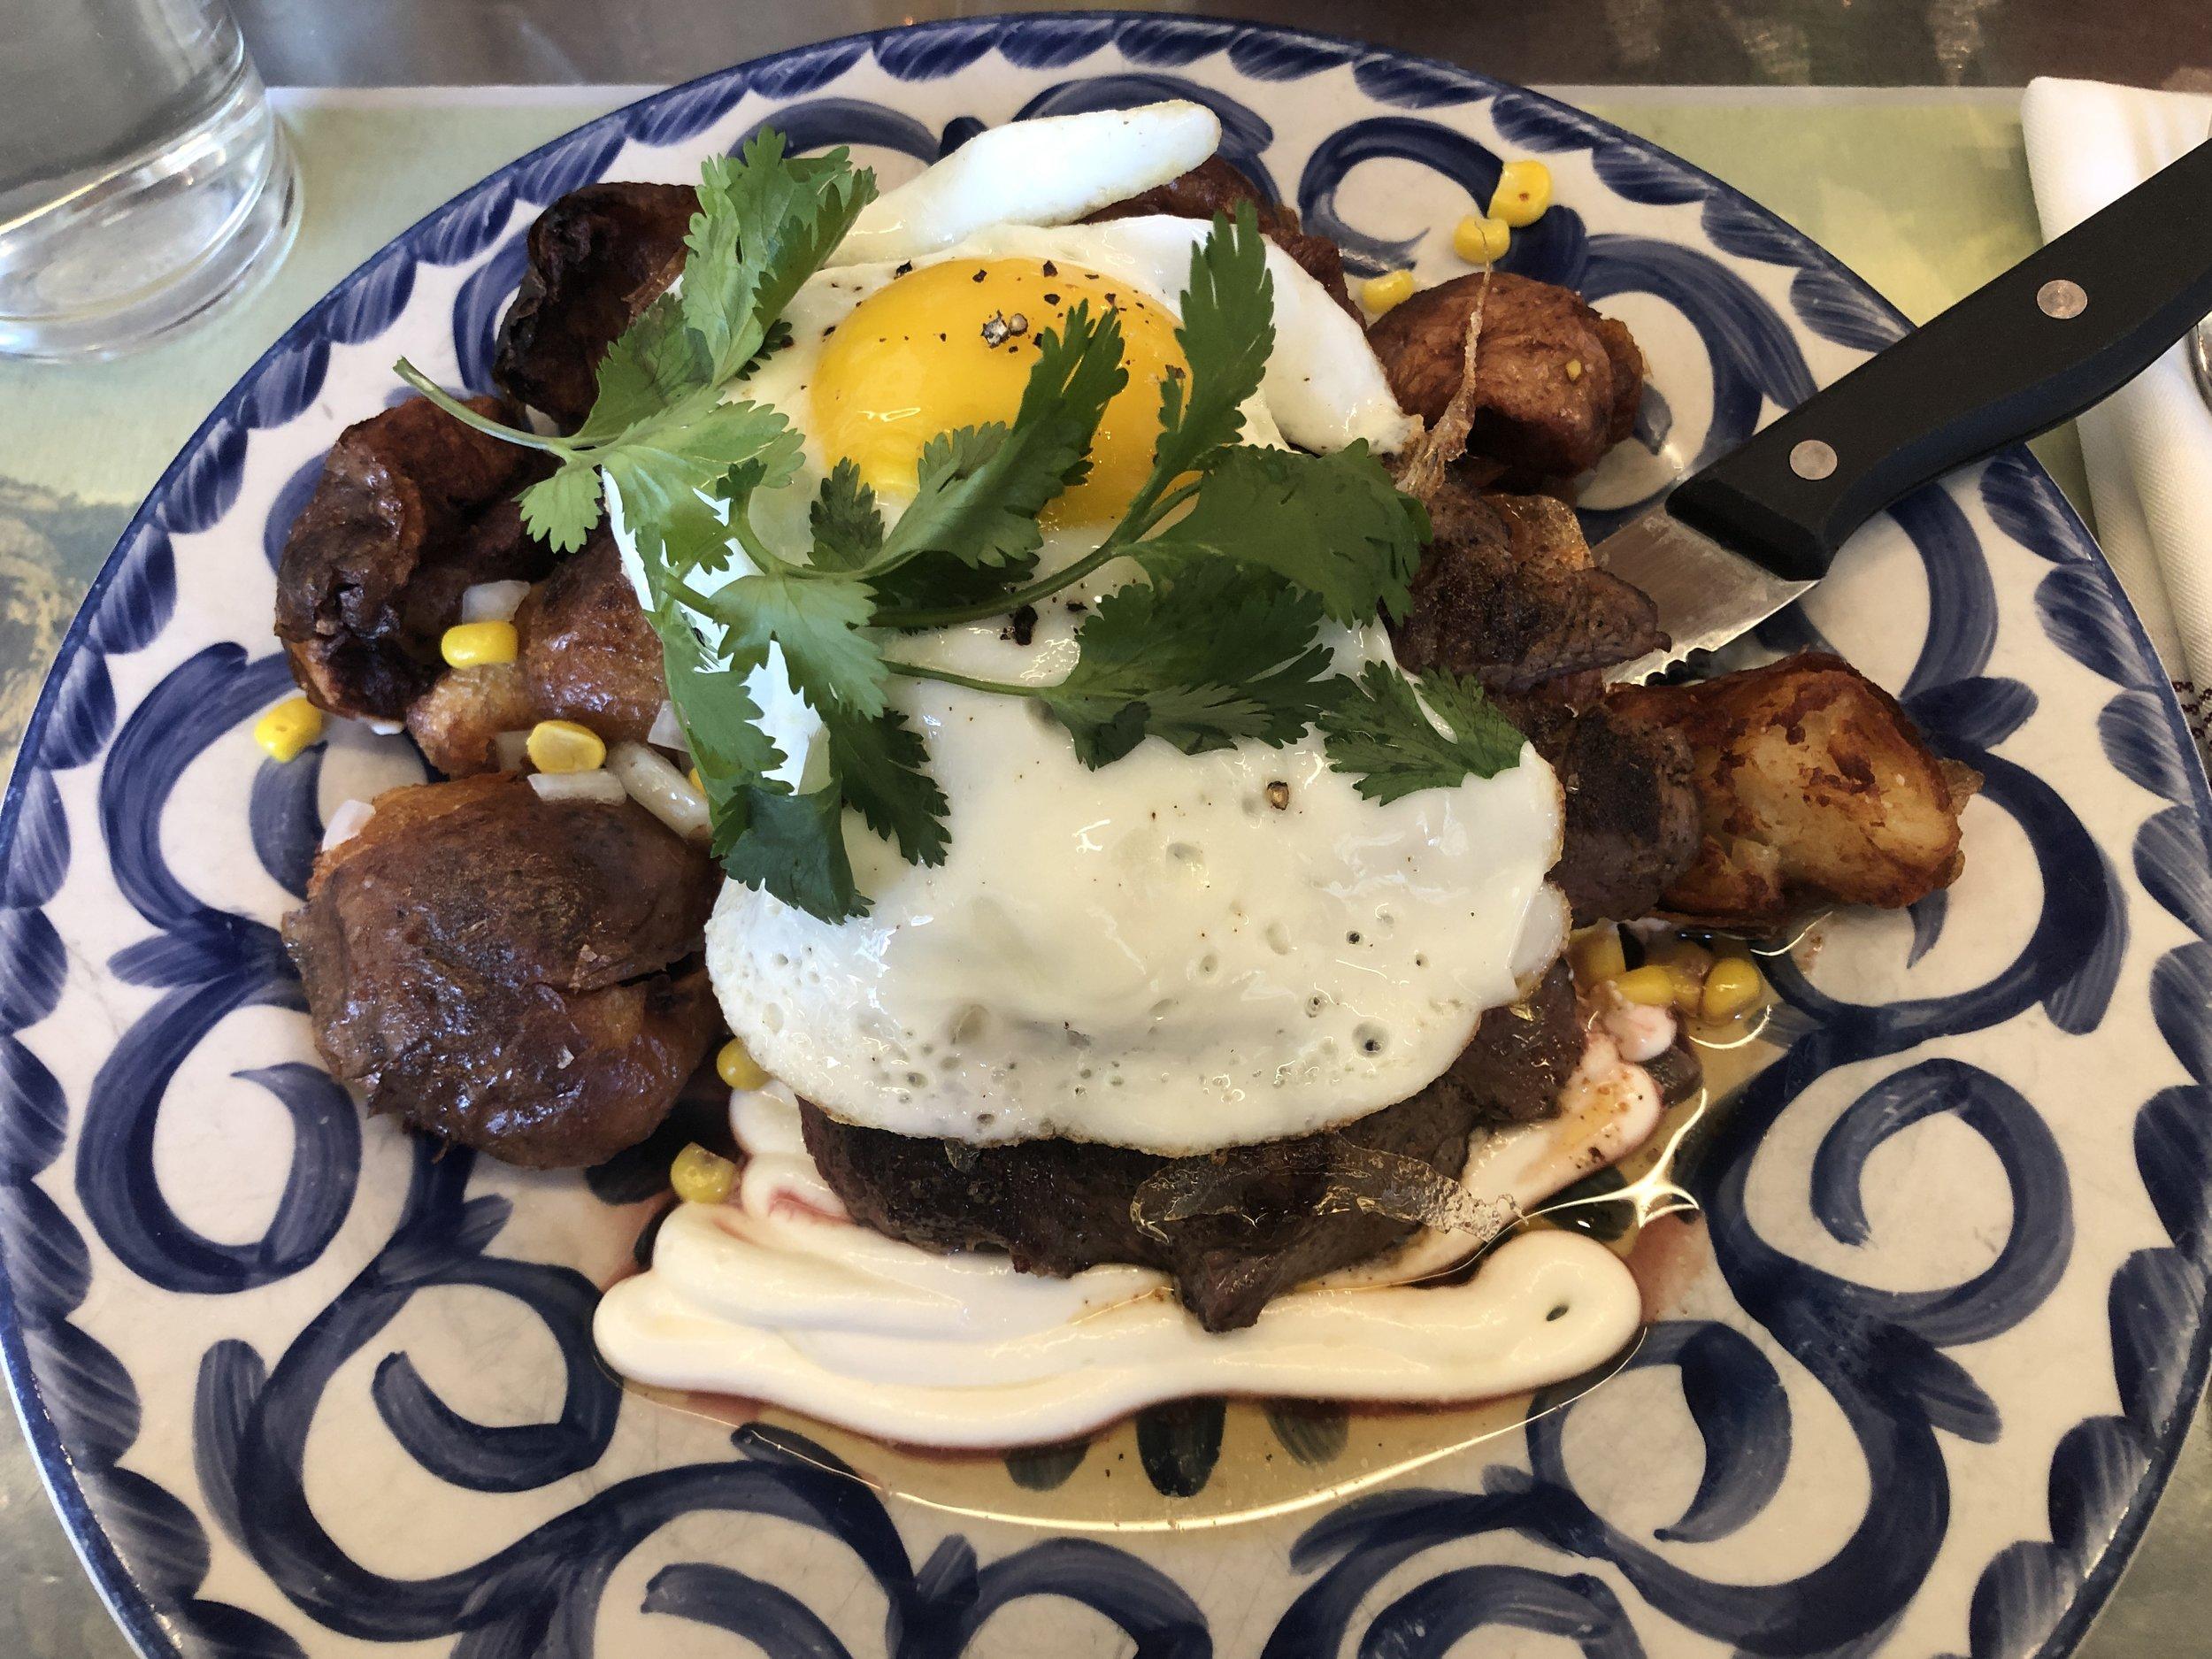 incredible eats at Dove's